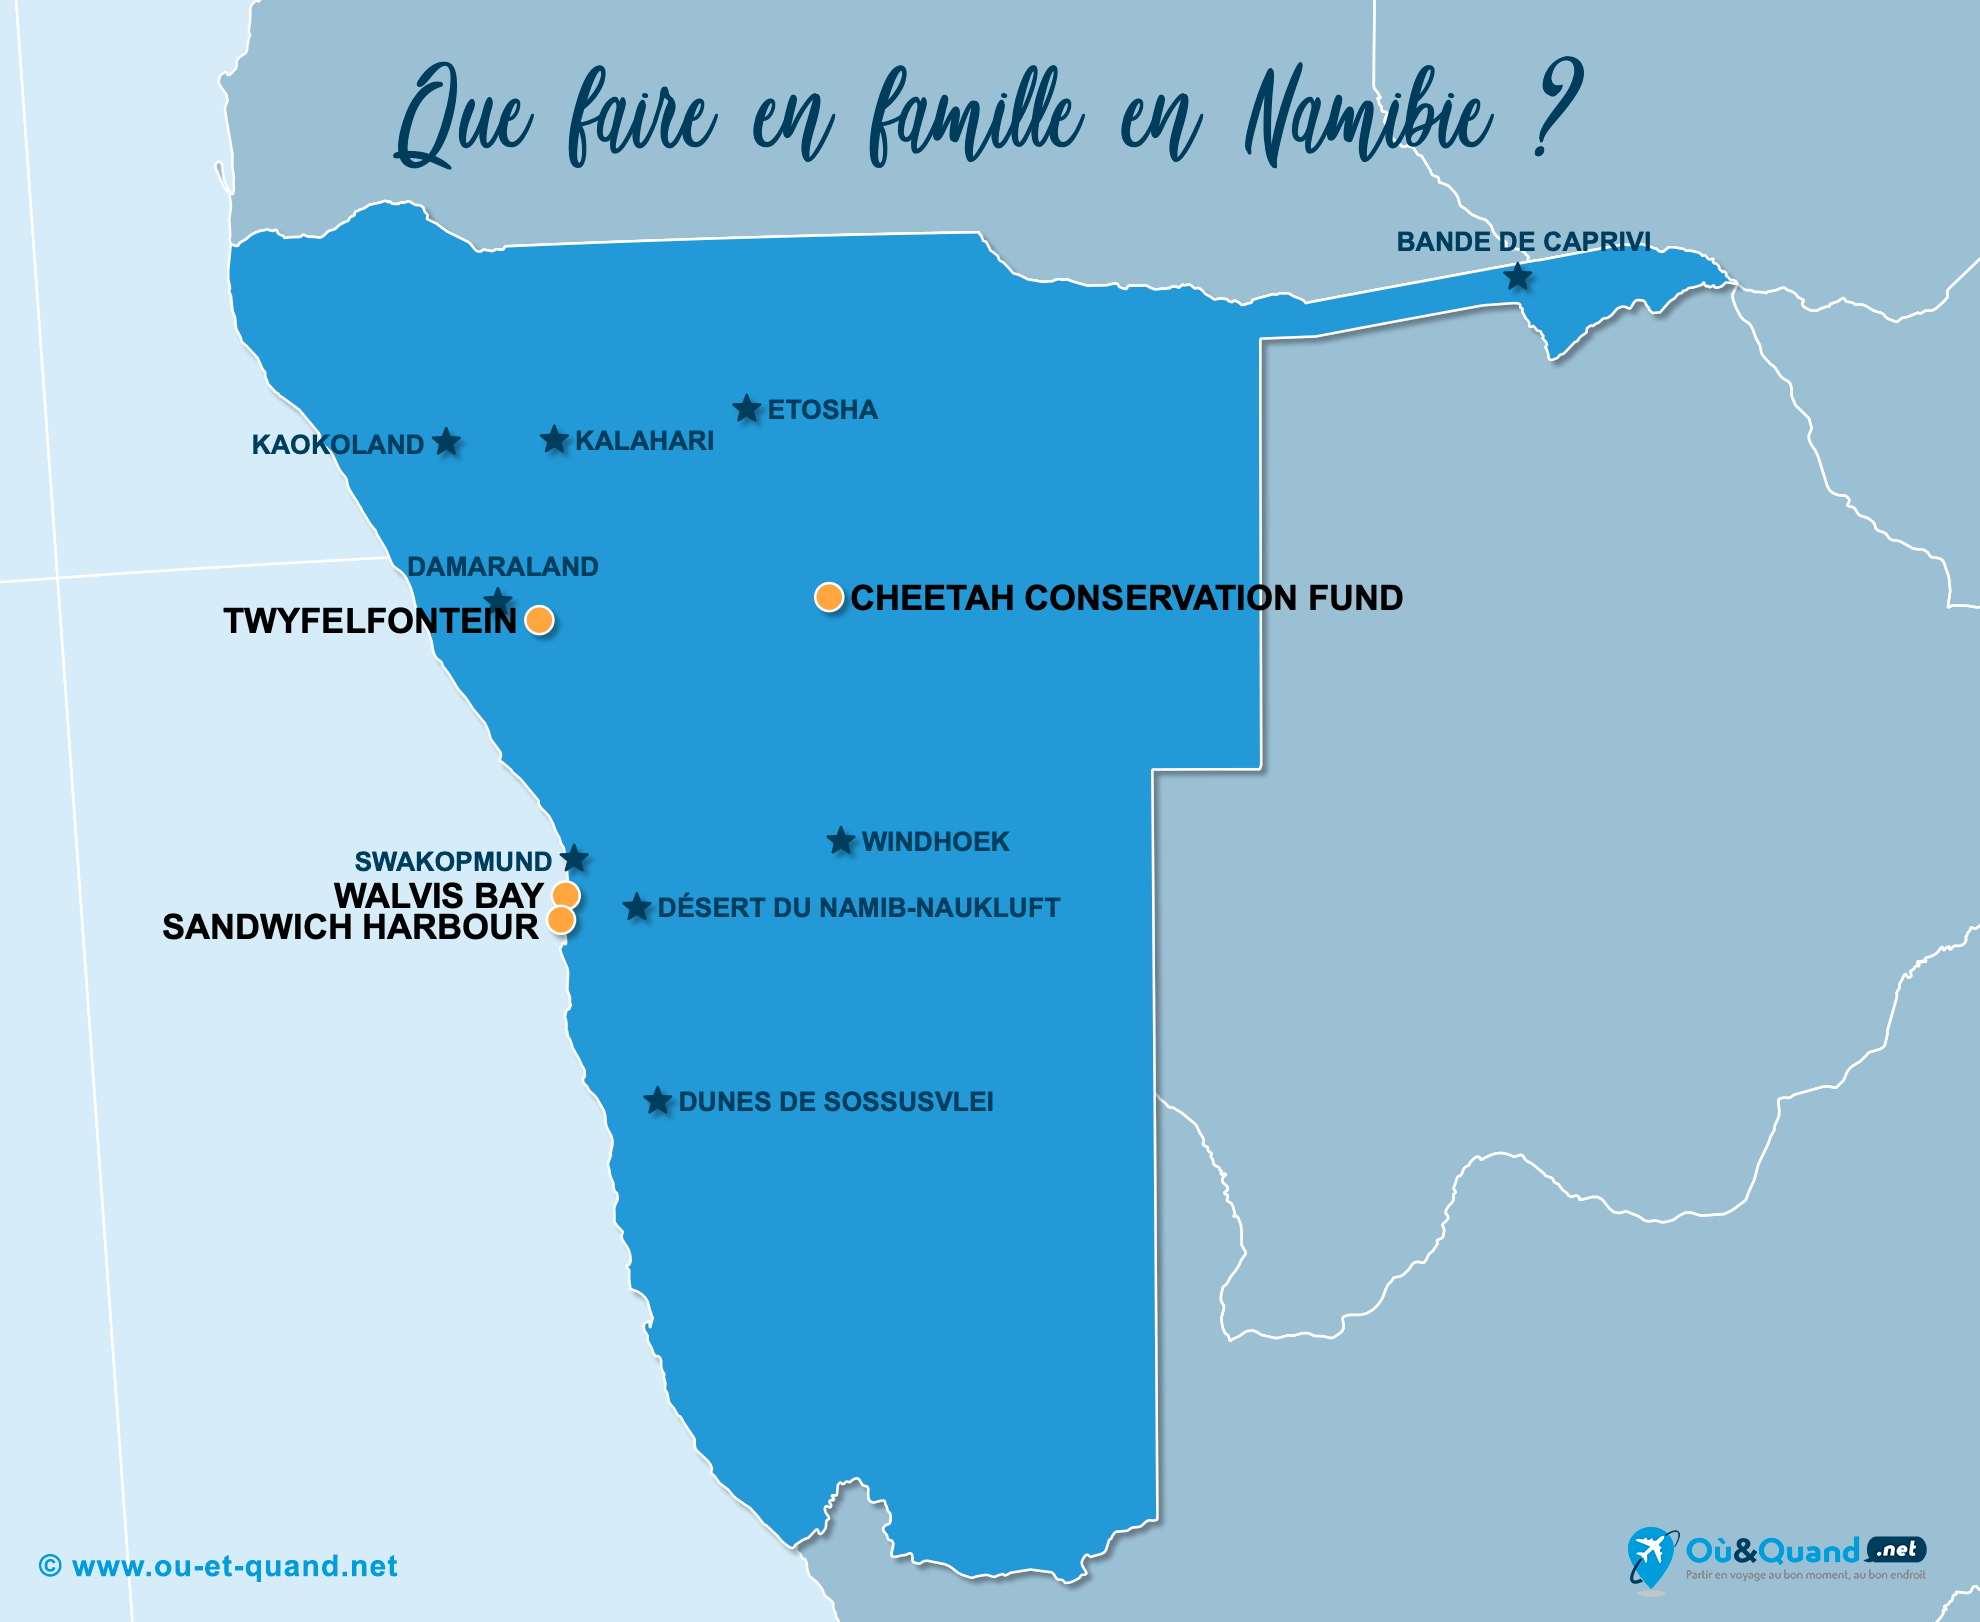 Carte Namibie : La Namibie en famille